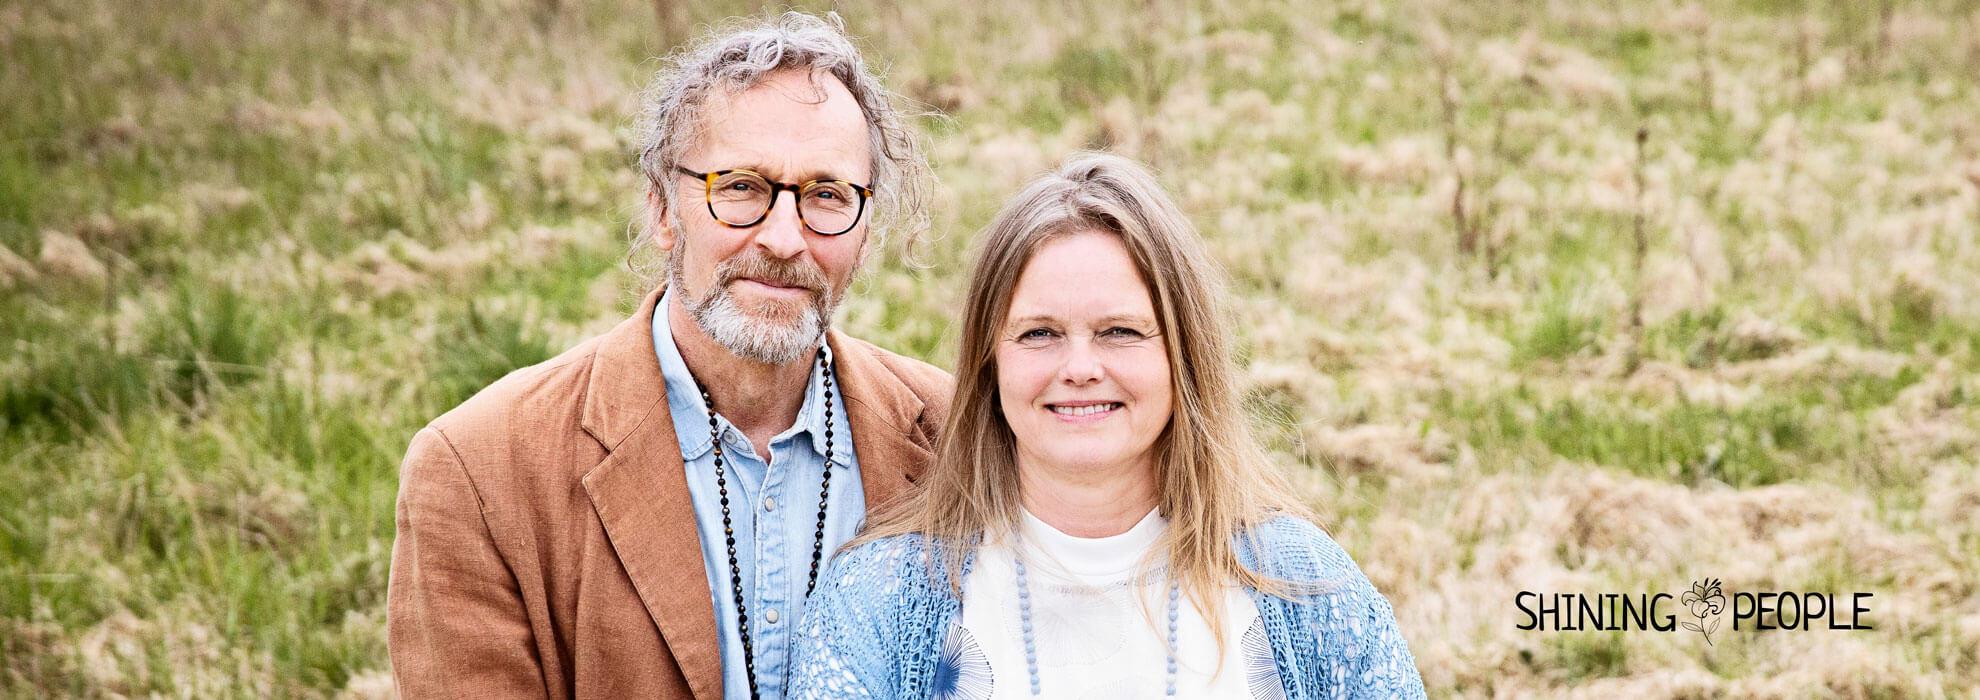 Shining People - Torben og Joyann Nielsen